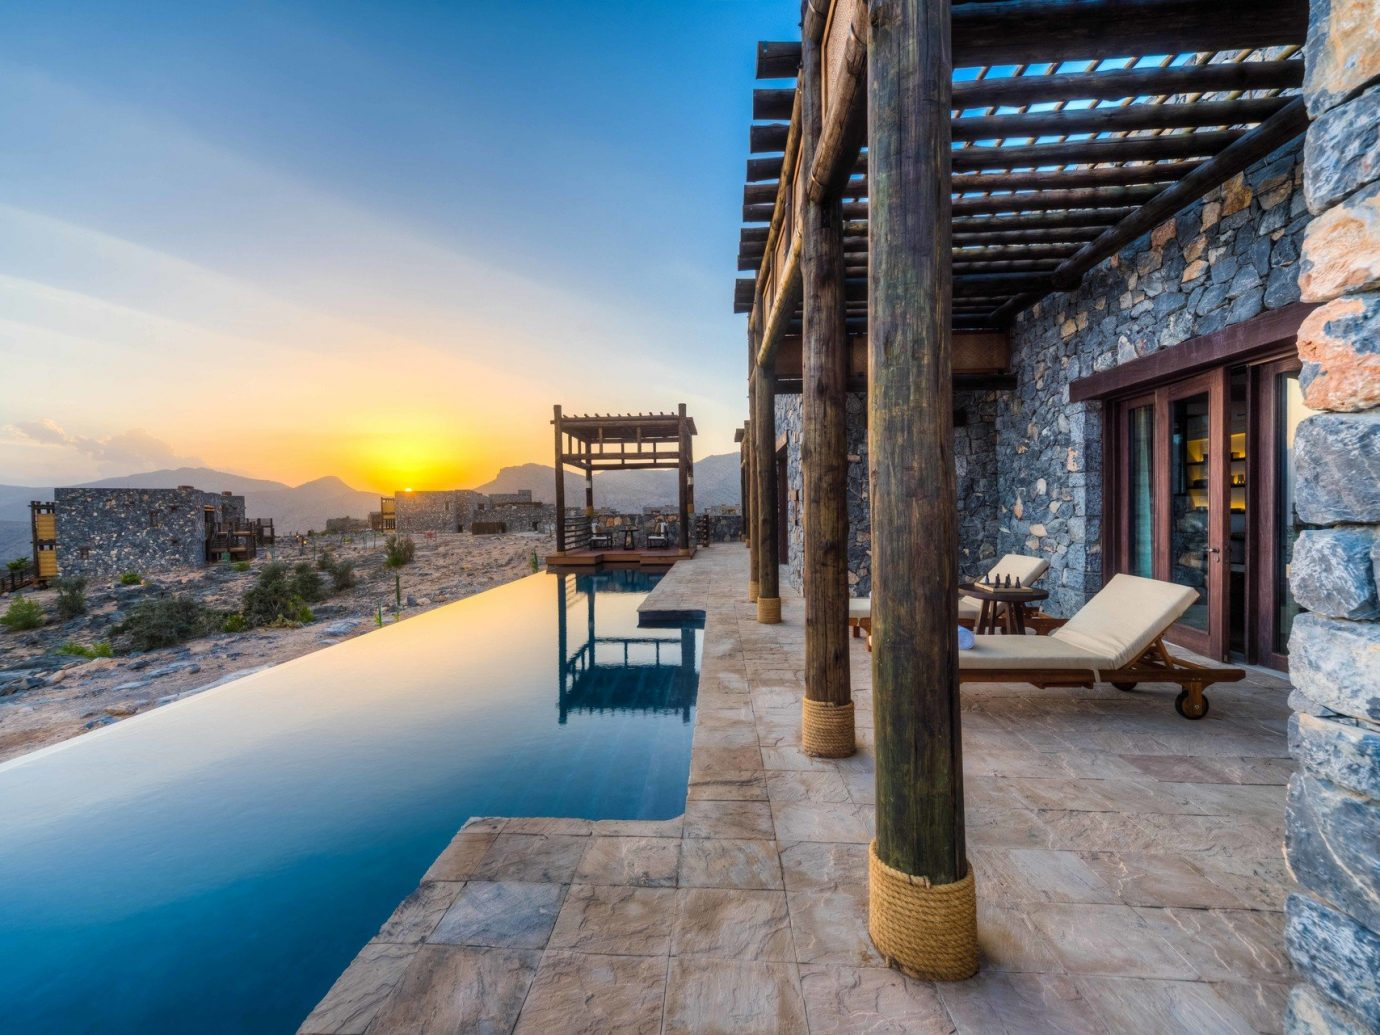 Travel Tips Trip Ideas sky outdoor vacation estate tourism Sea travel Resort stone